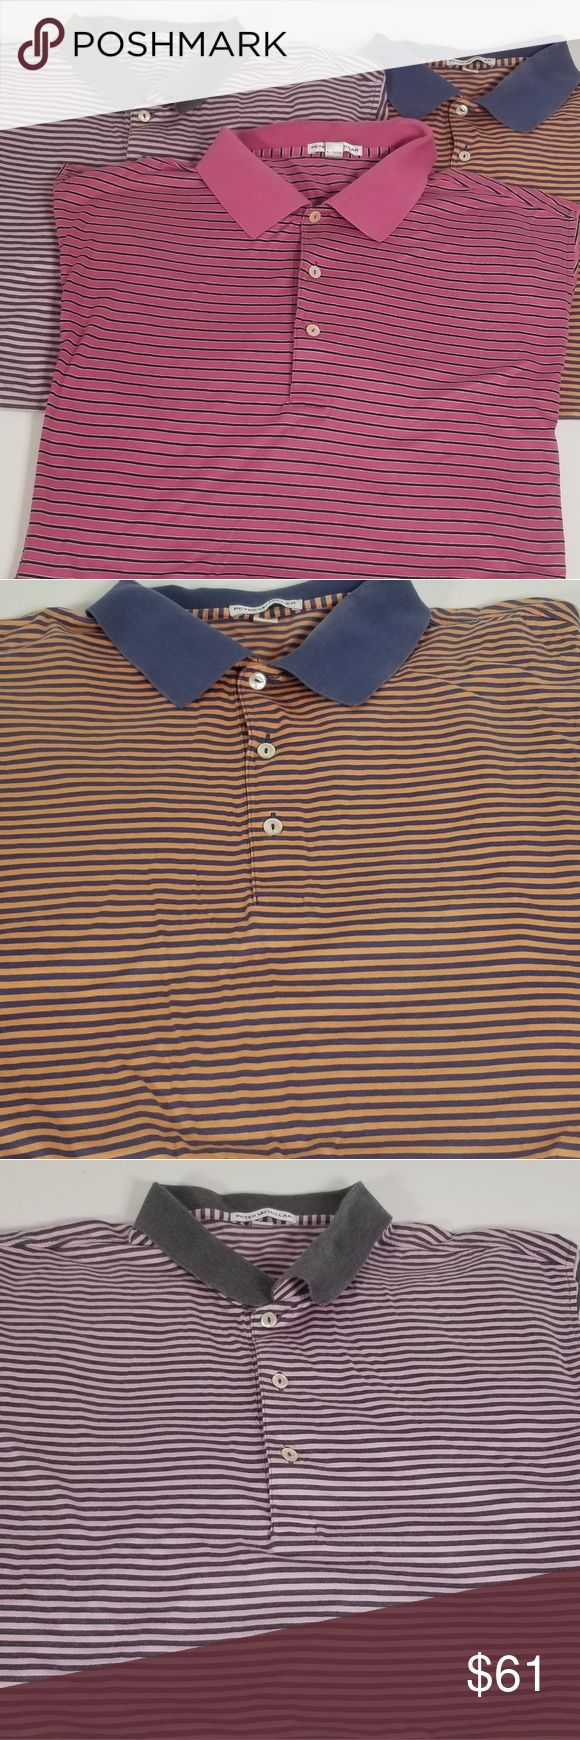 Lot of 3 Peter Millar XL Polo Golf Shirts EUC no flaws